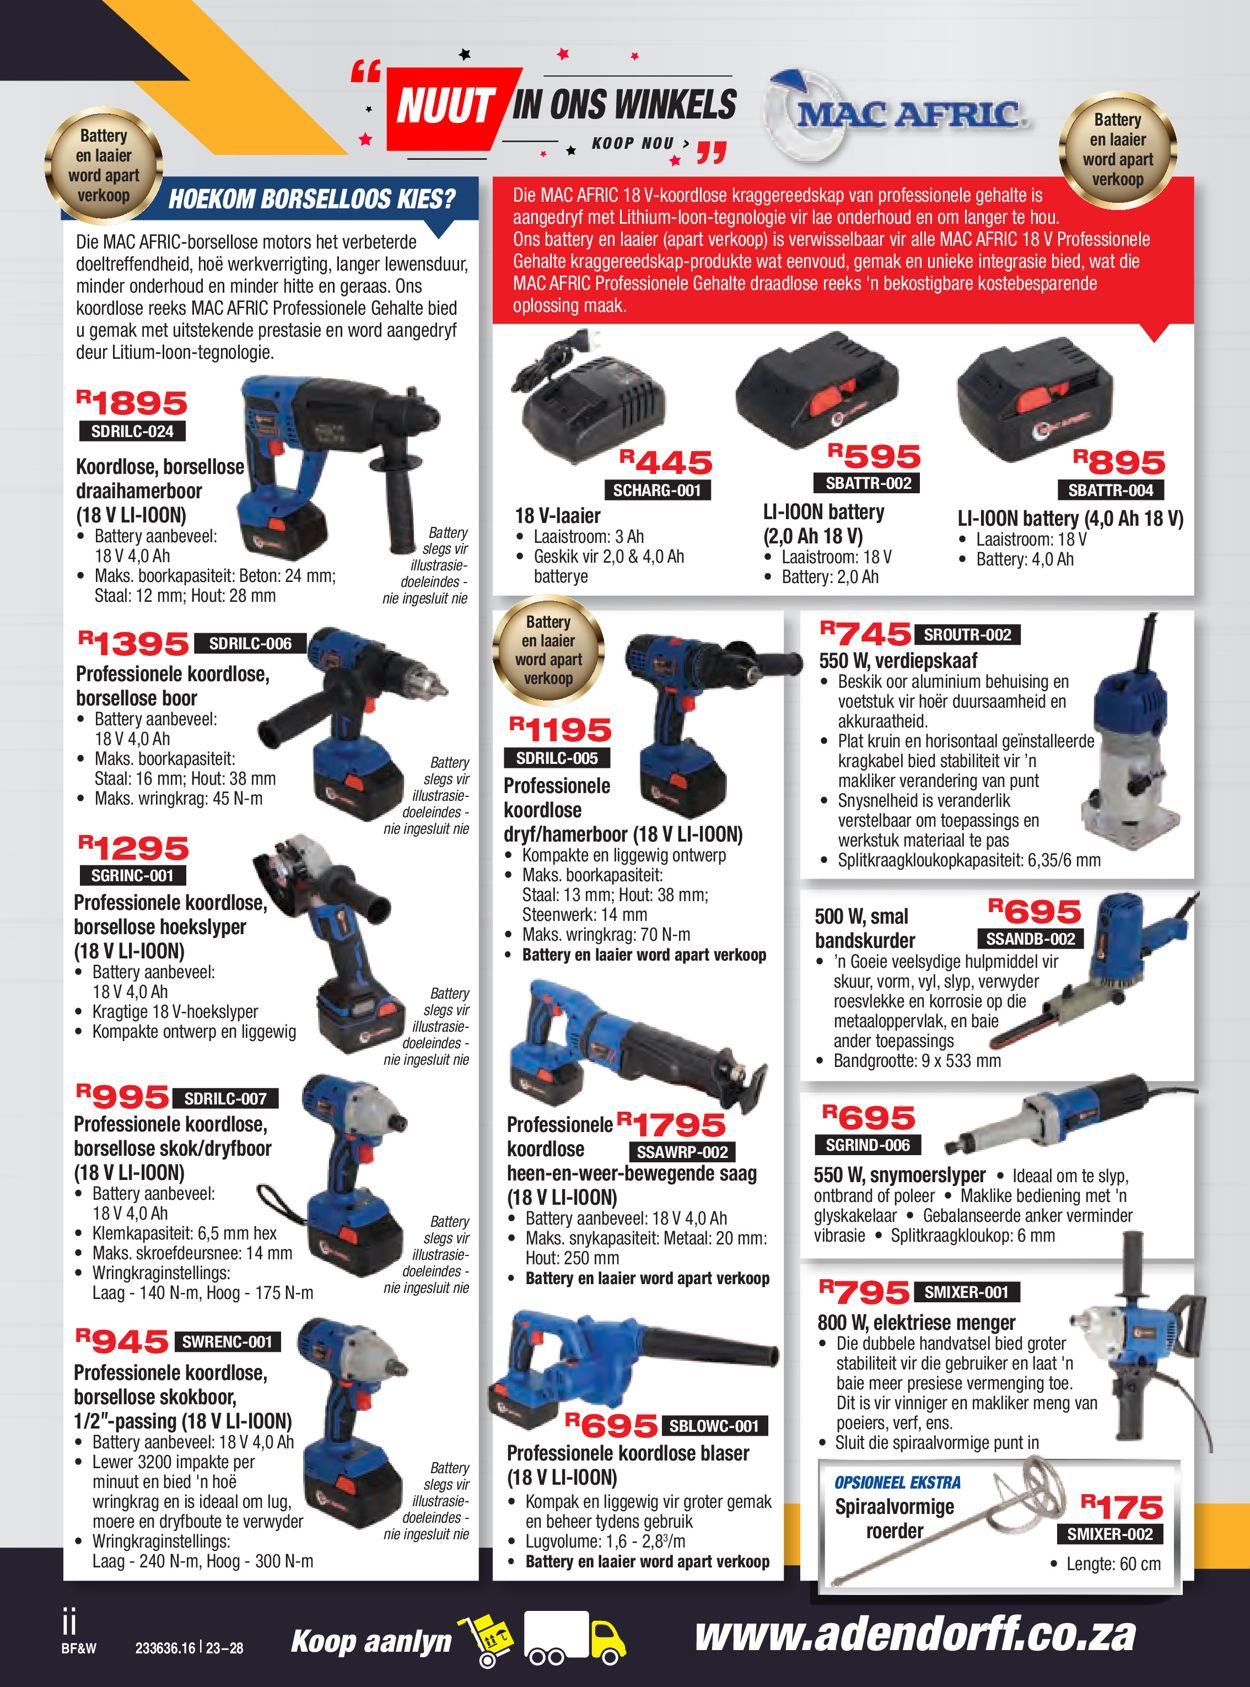 Adendorff Machinery Mart Black Friday 2020 Catalogue - 2020/11/23-2020/11/28 (Page 2)